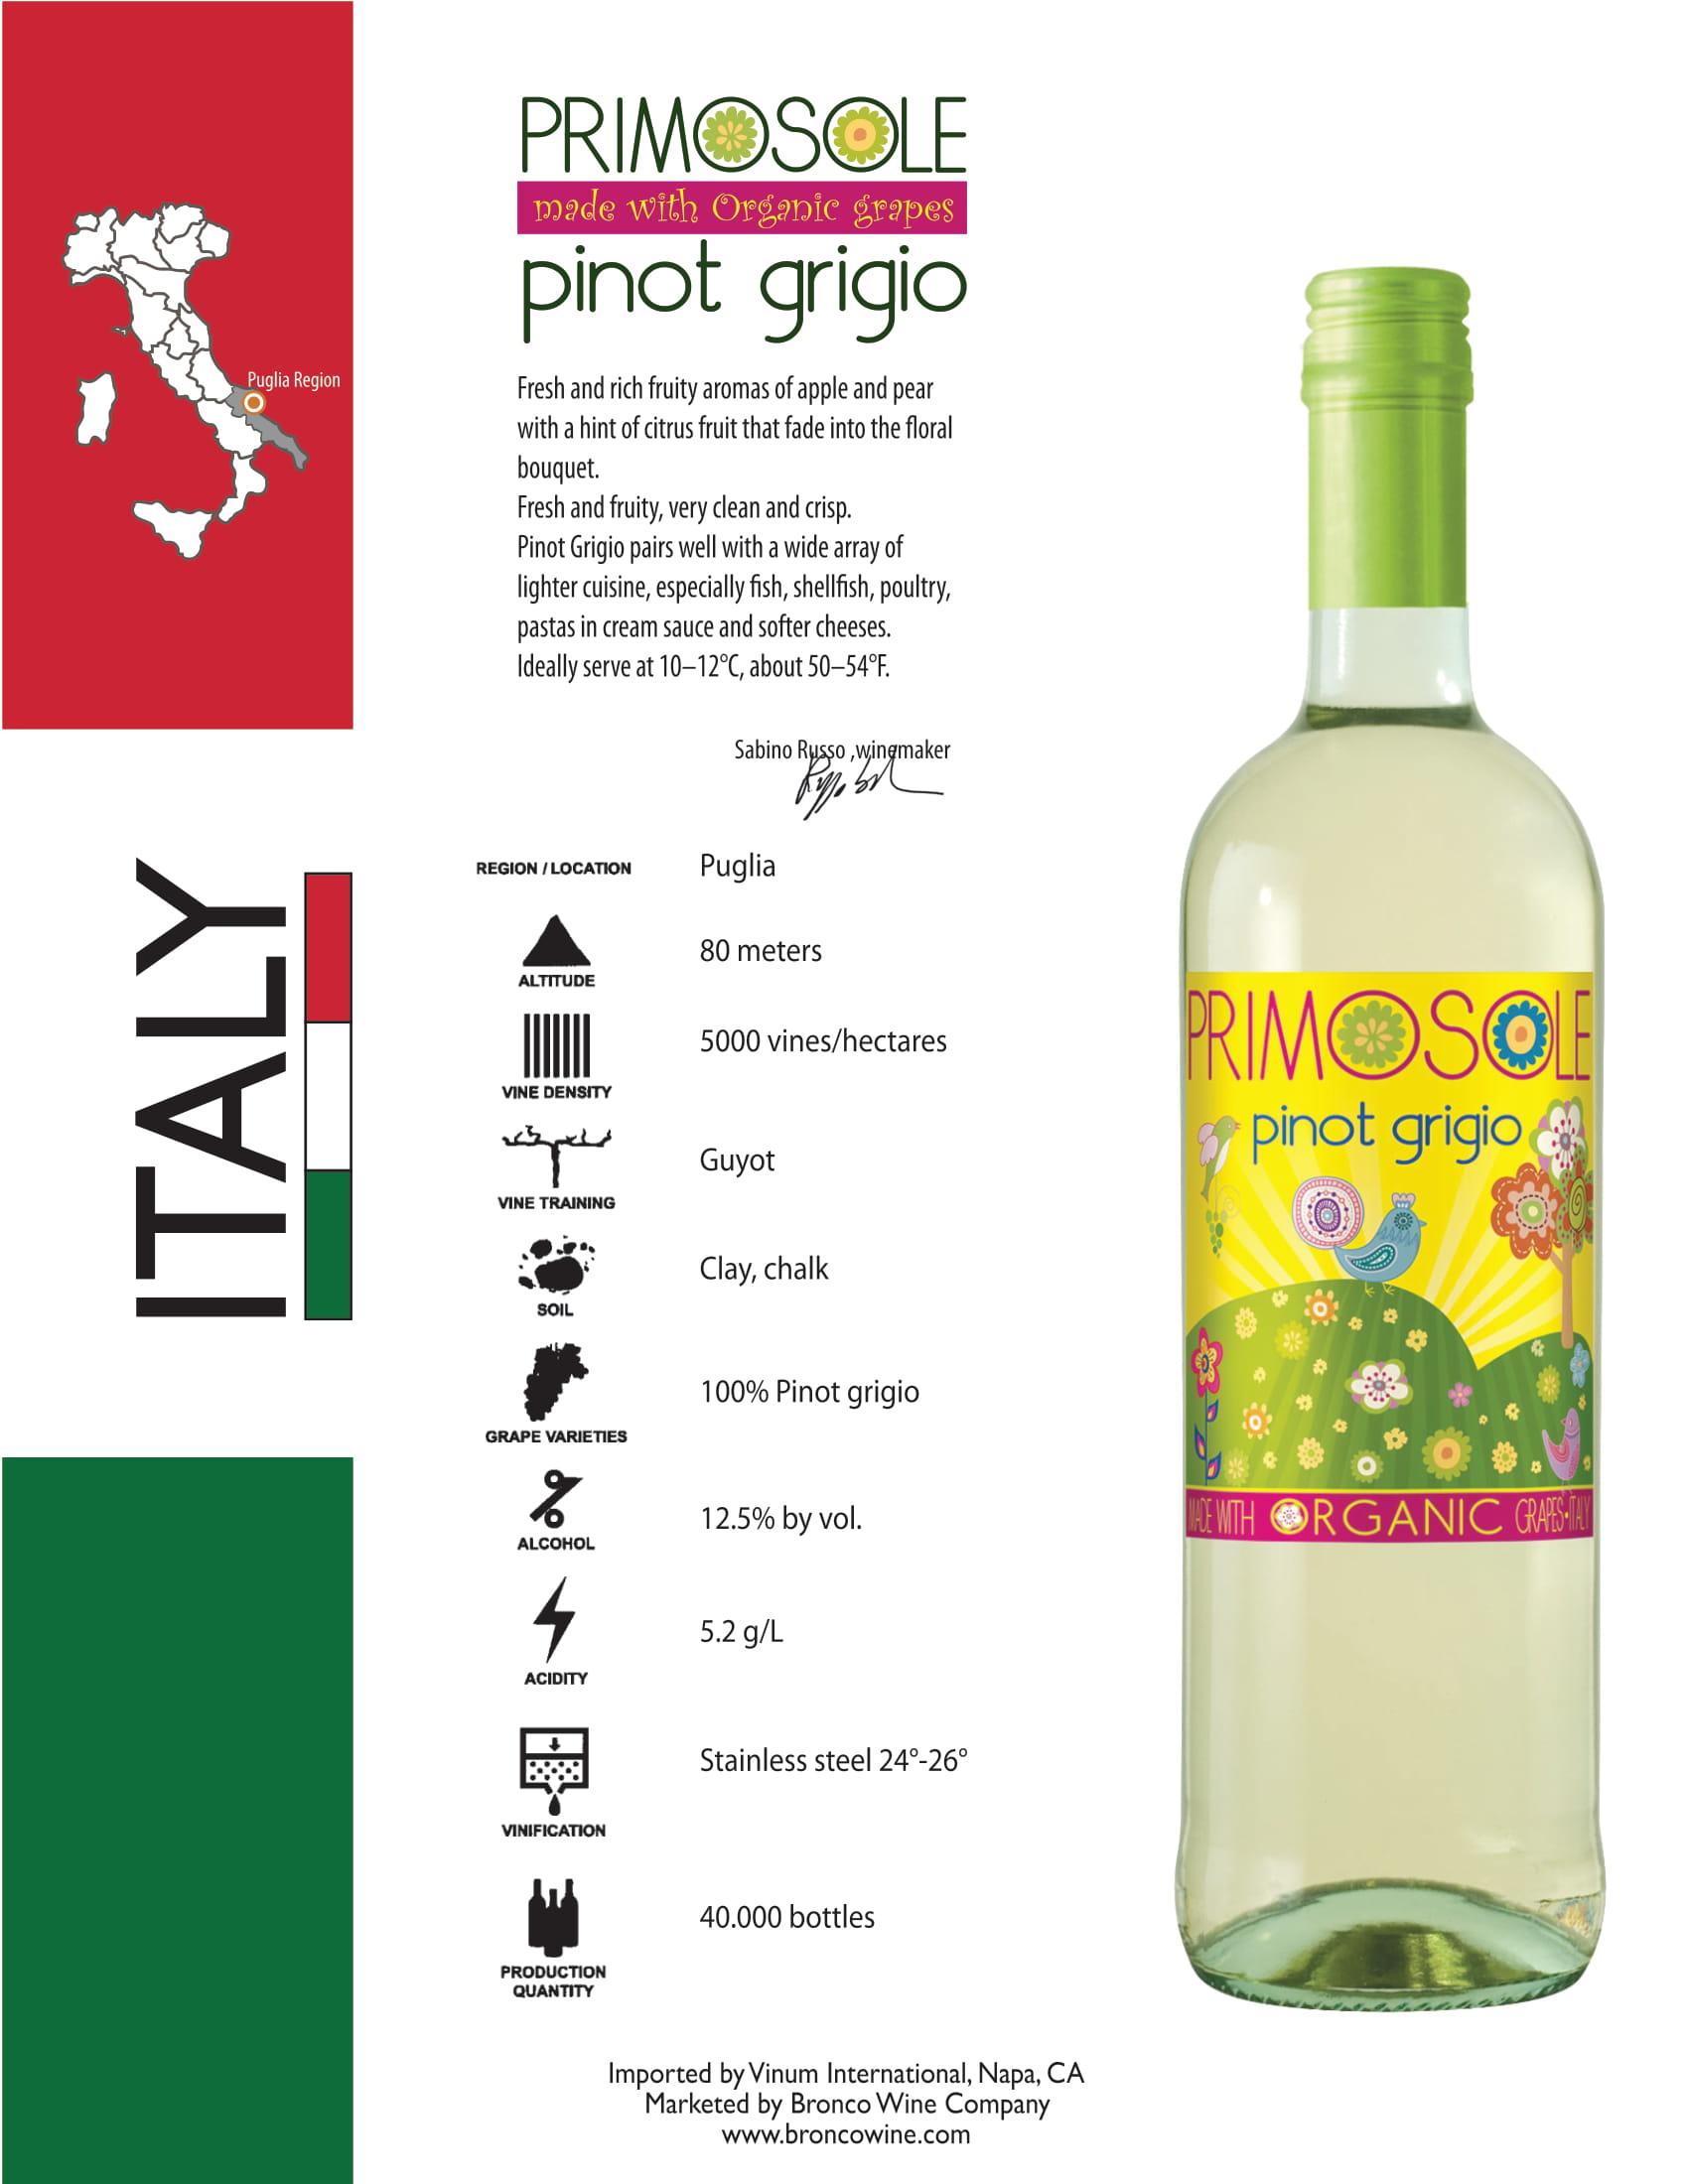 PrimoSole Pinot Grigio Tech Sheet